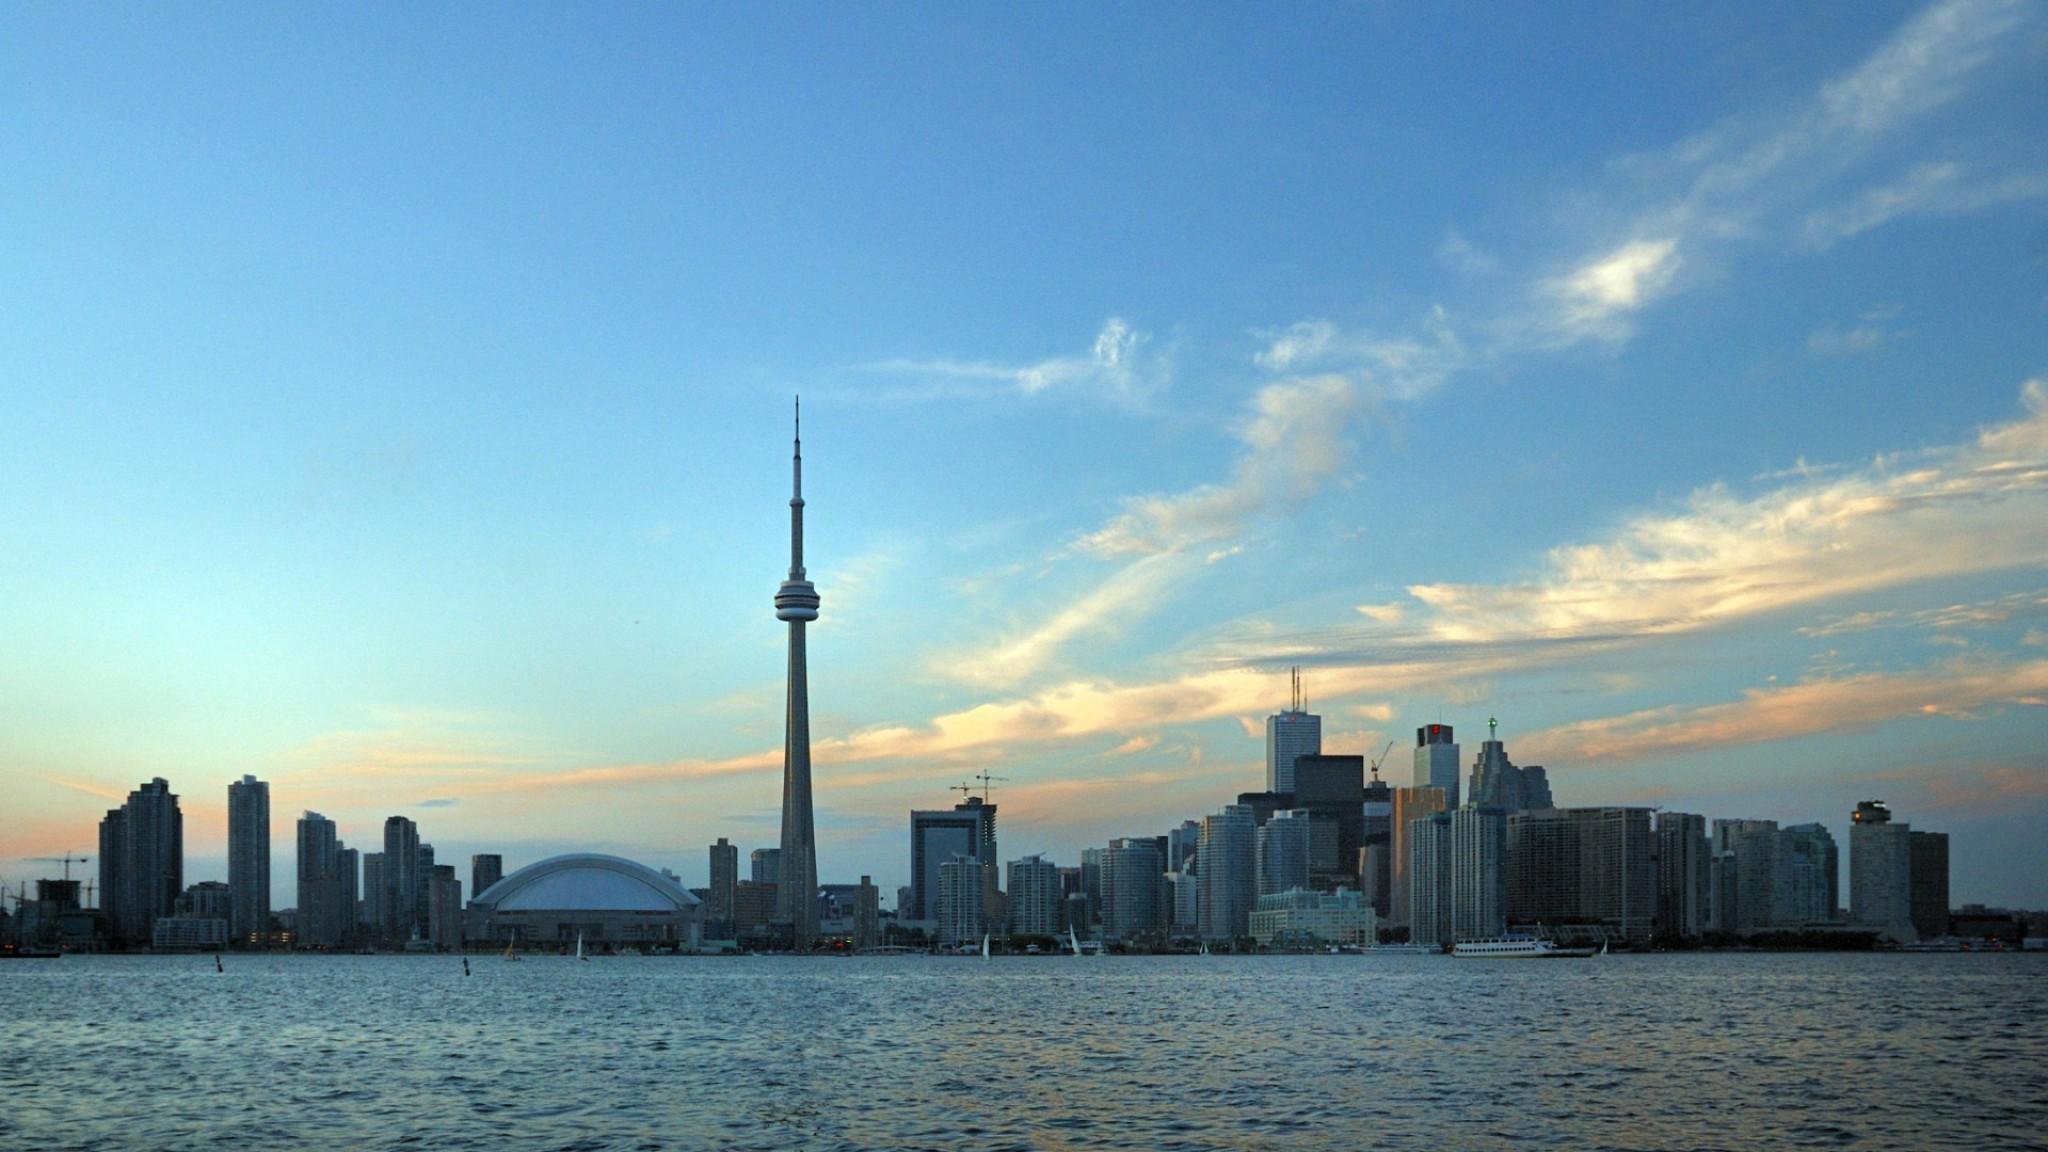 Building  City  Toronto  Canada   America s  HD Wallpaper